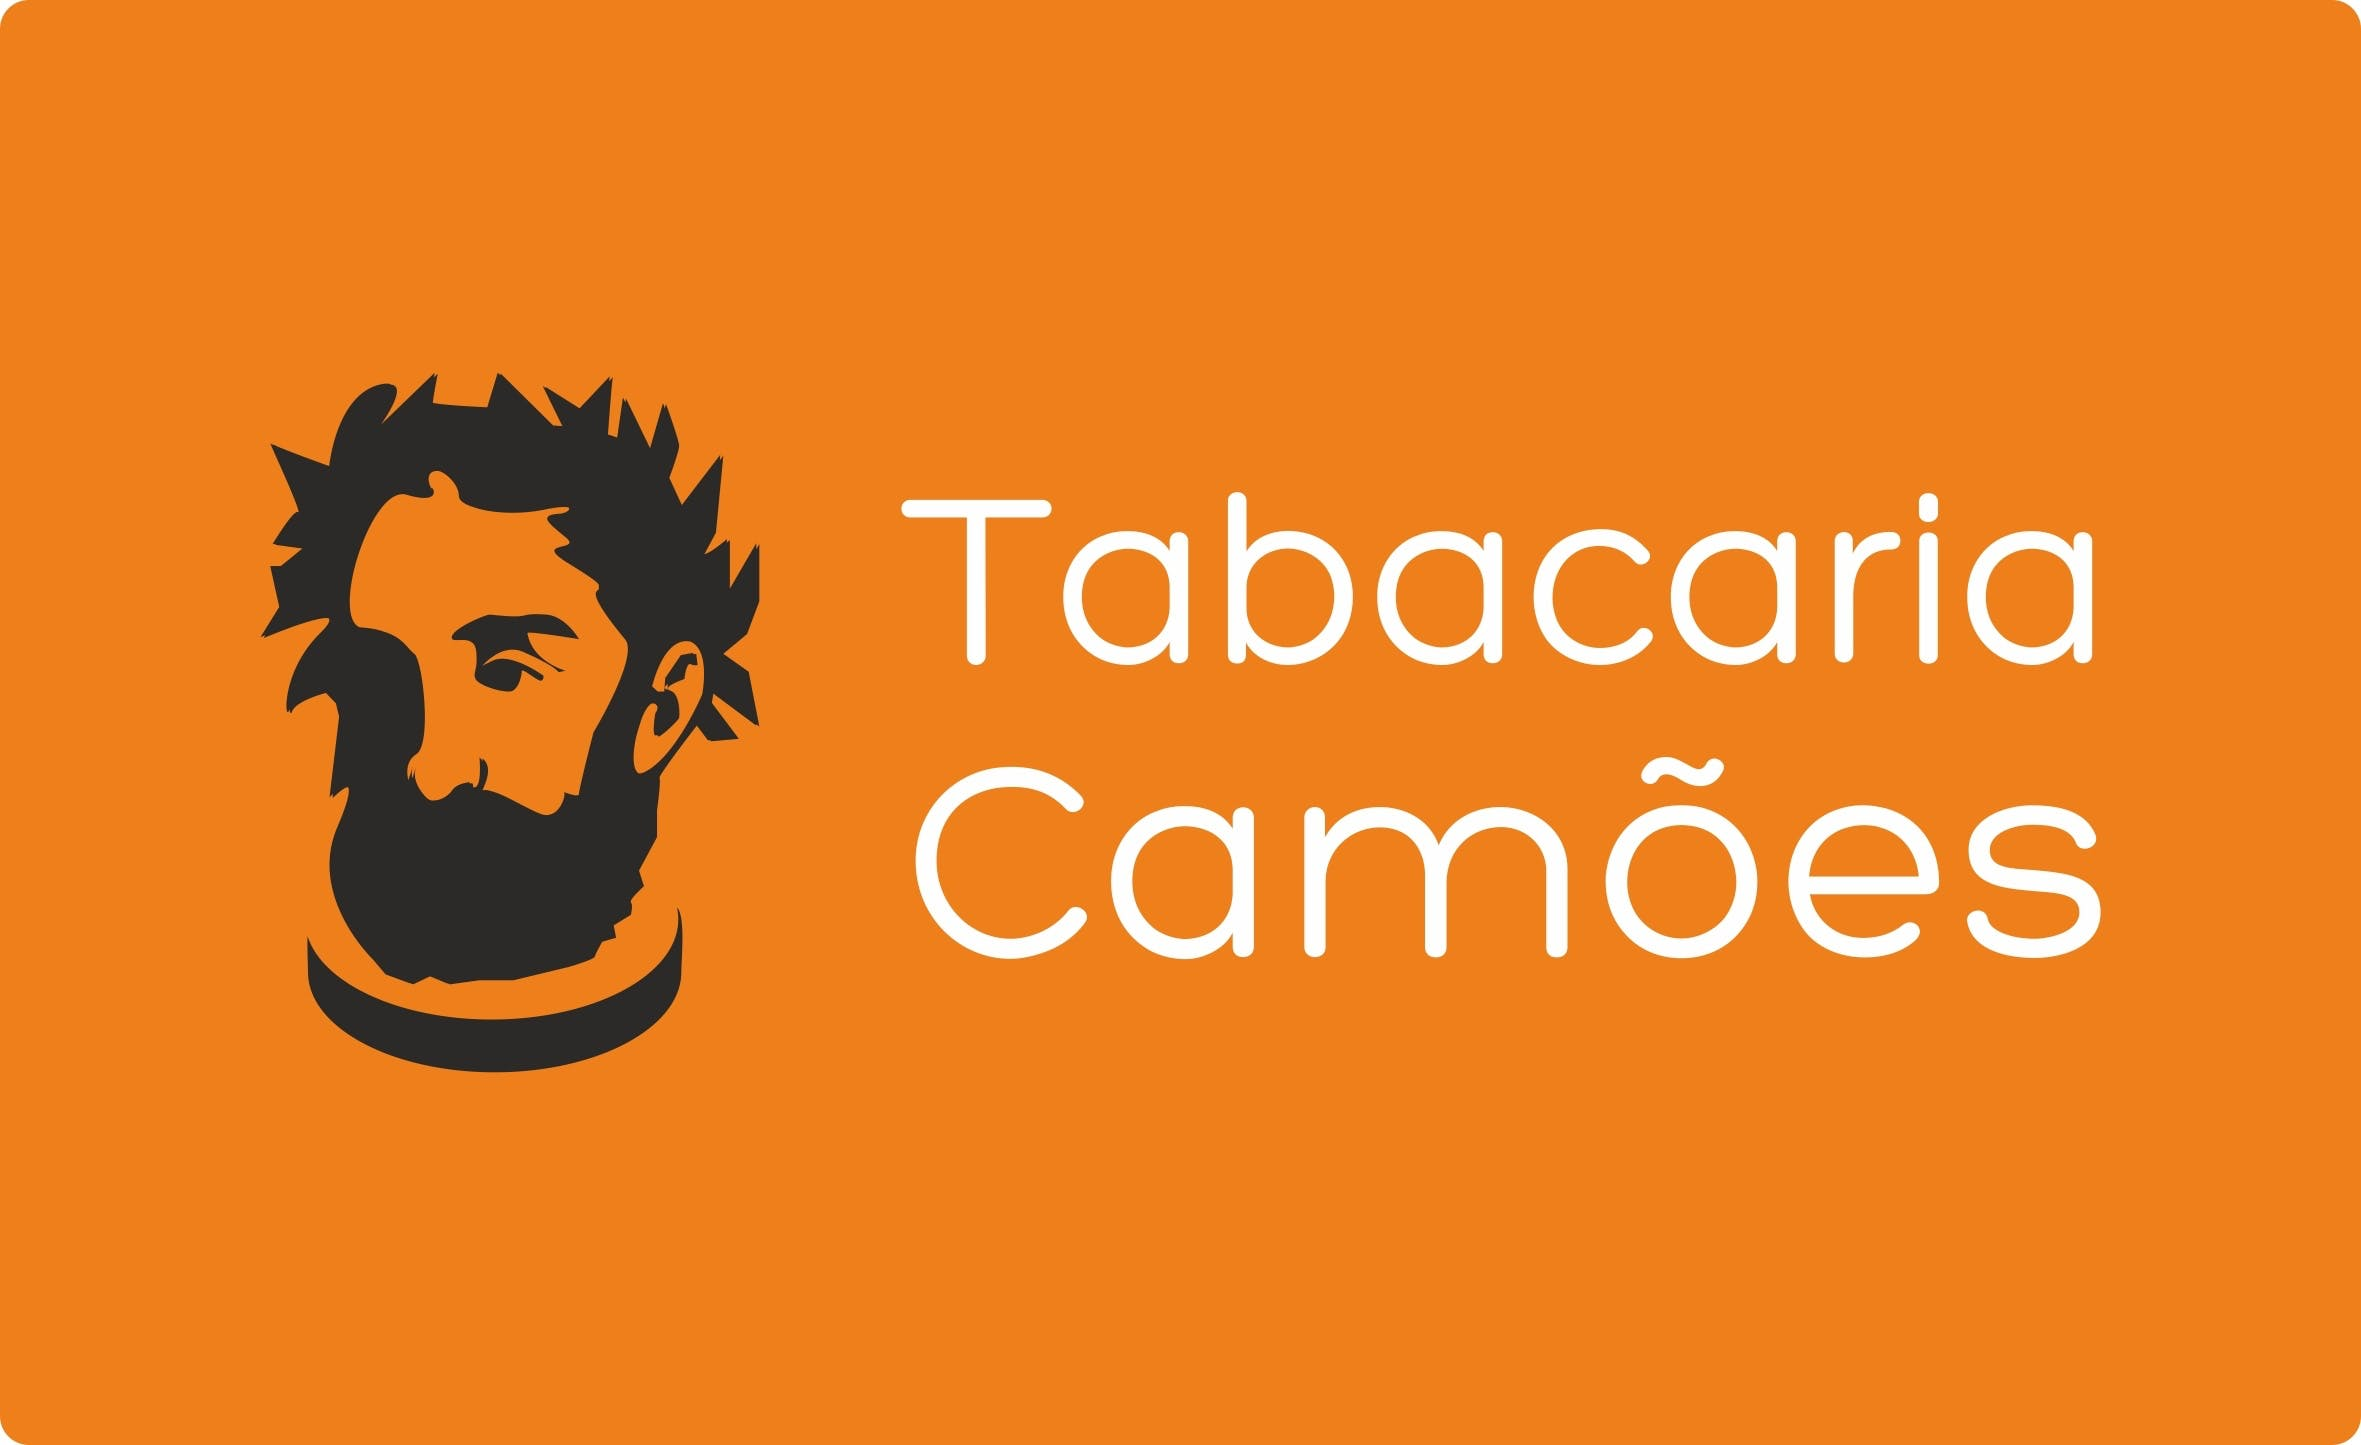 TABACARIA CAMOES